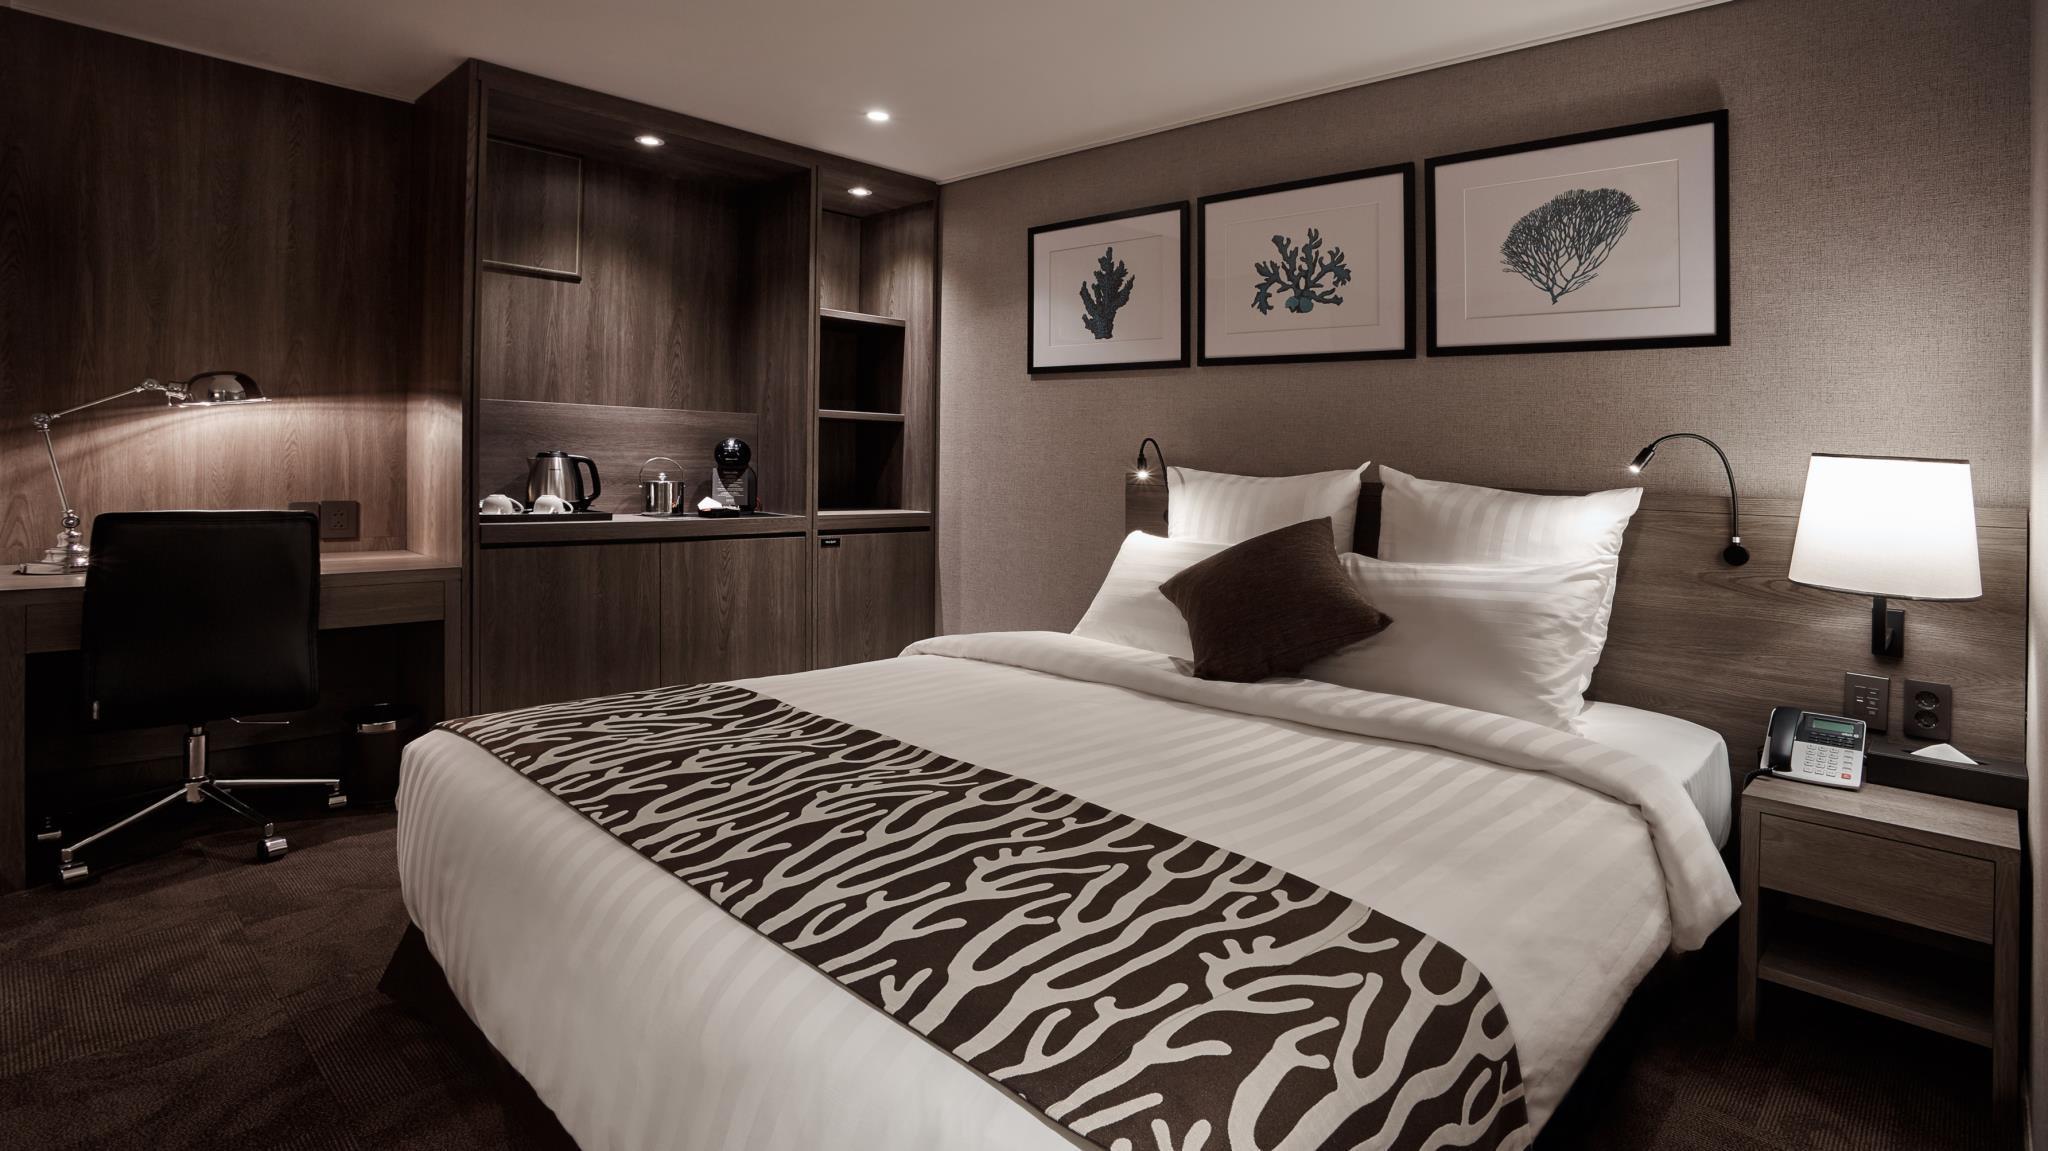 Kent Hotel Gwangalli by Kensington, Suyeong